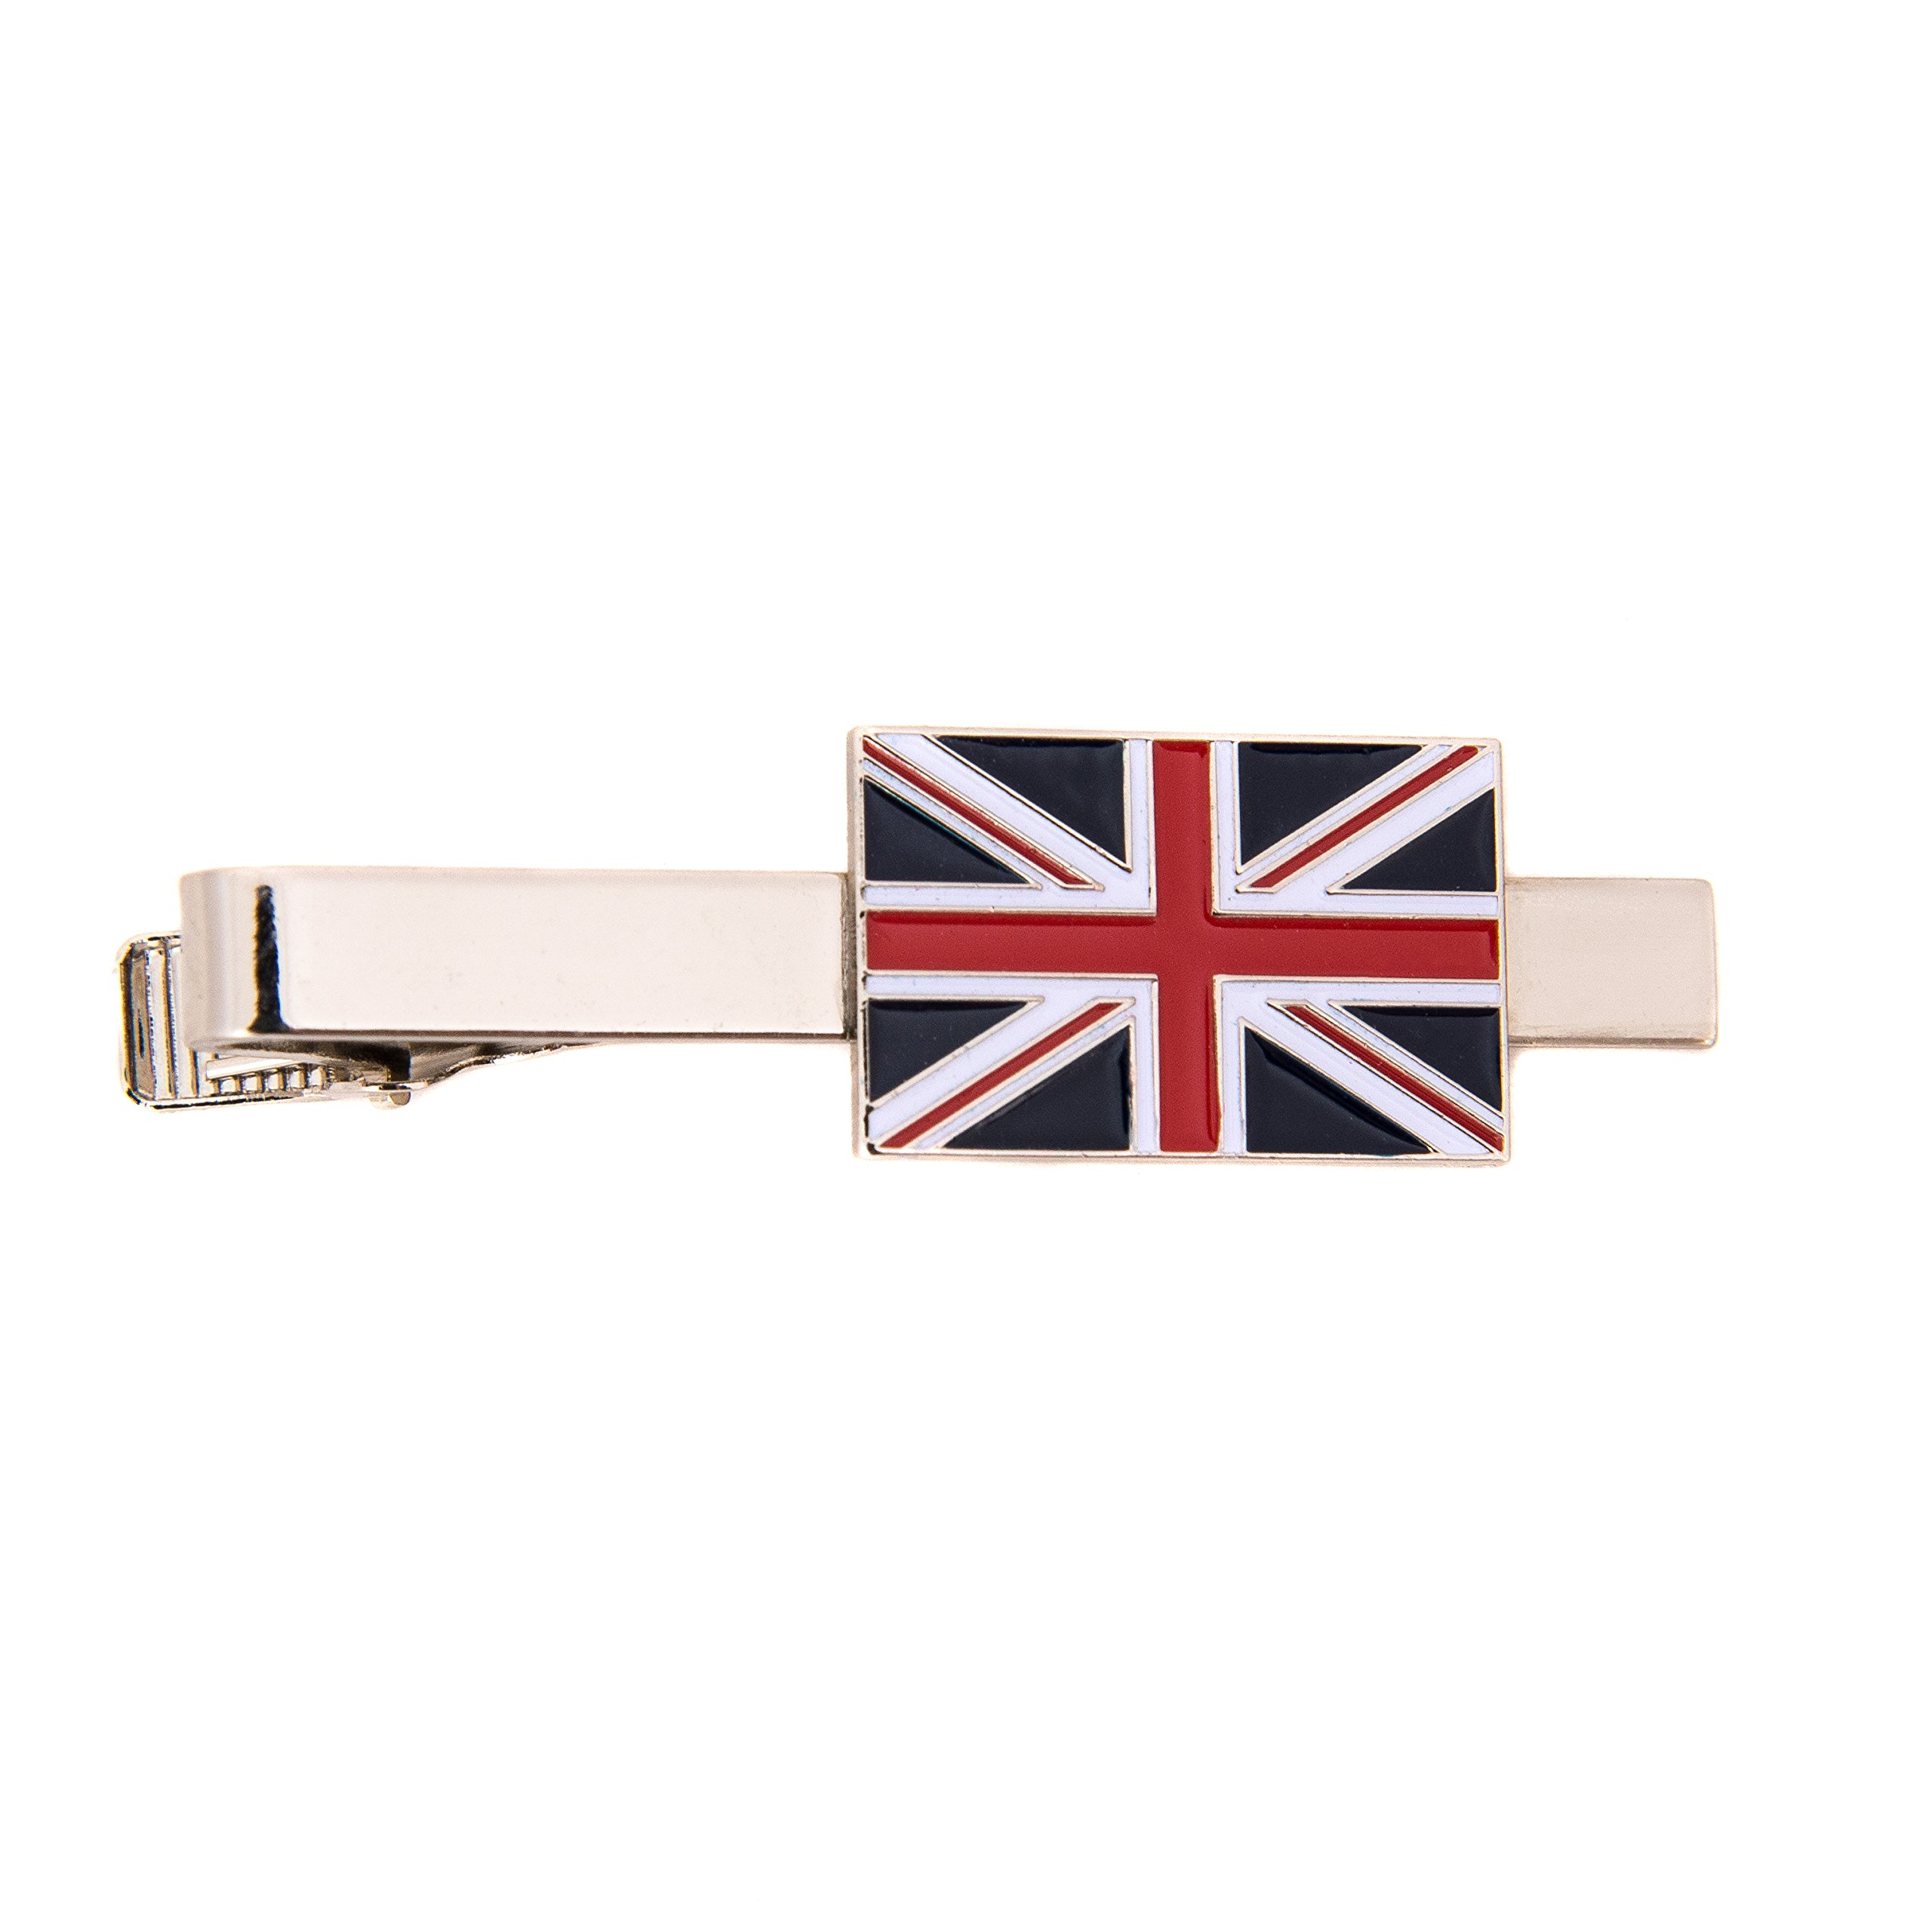 United Kingdom UK Country Rectangle Flag Tie Bar Made of Metal Souvenir